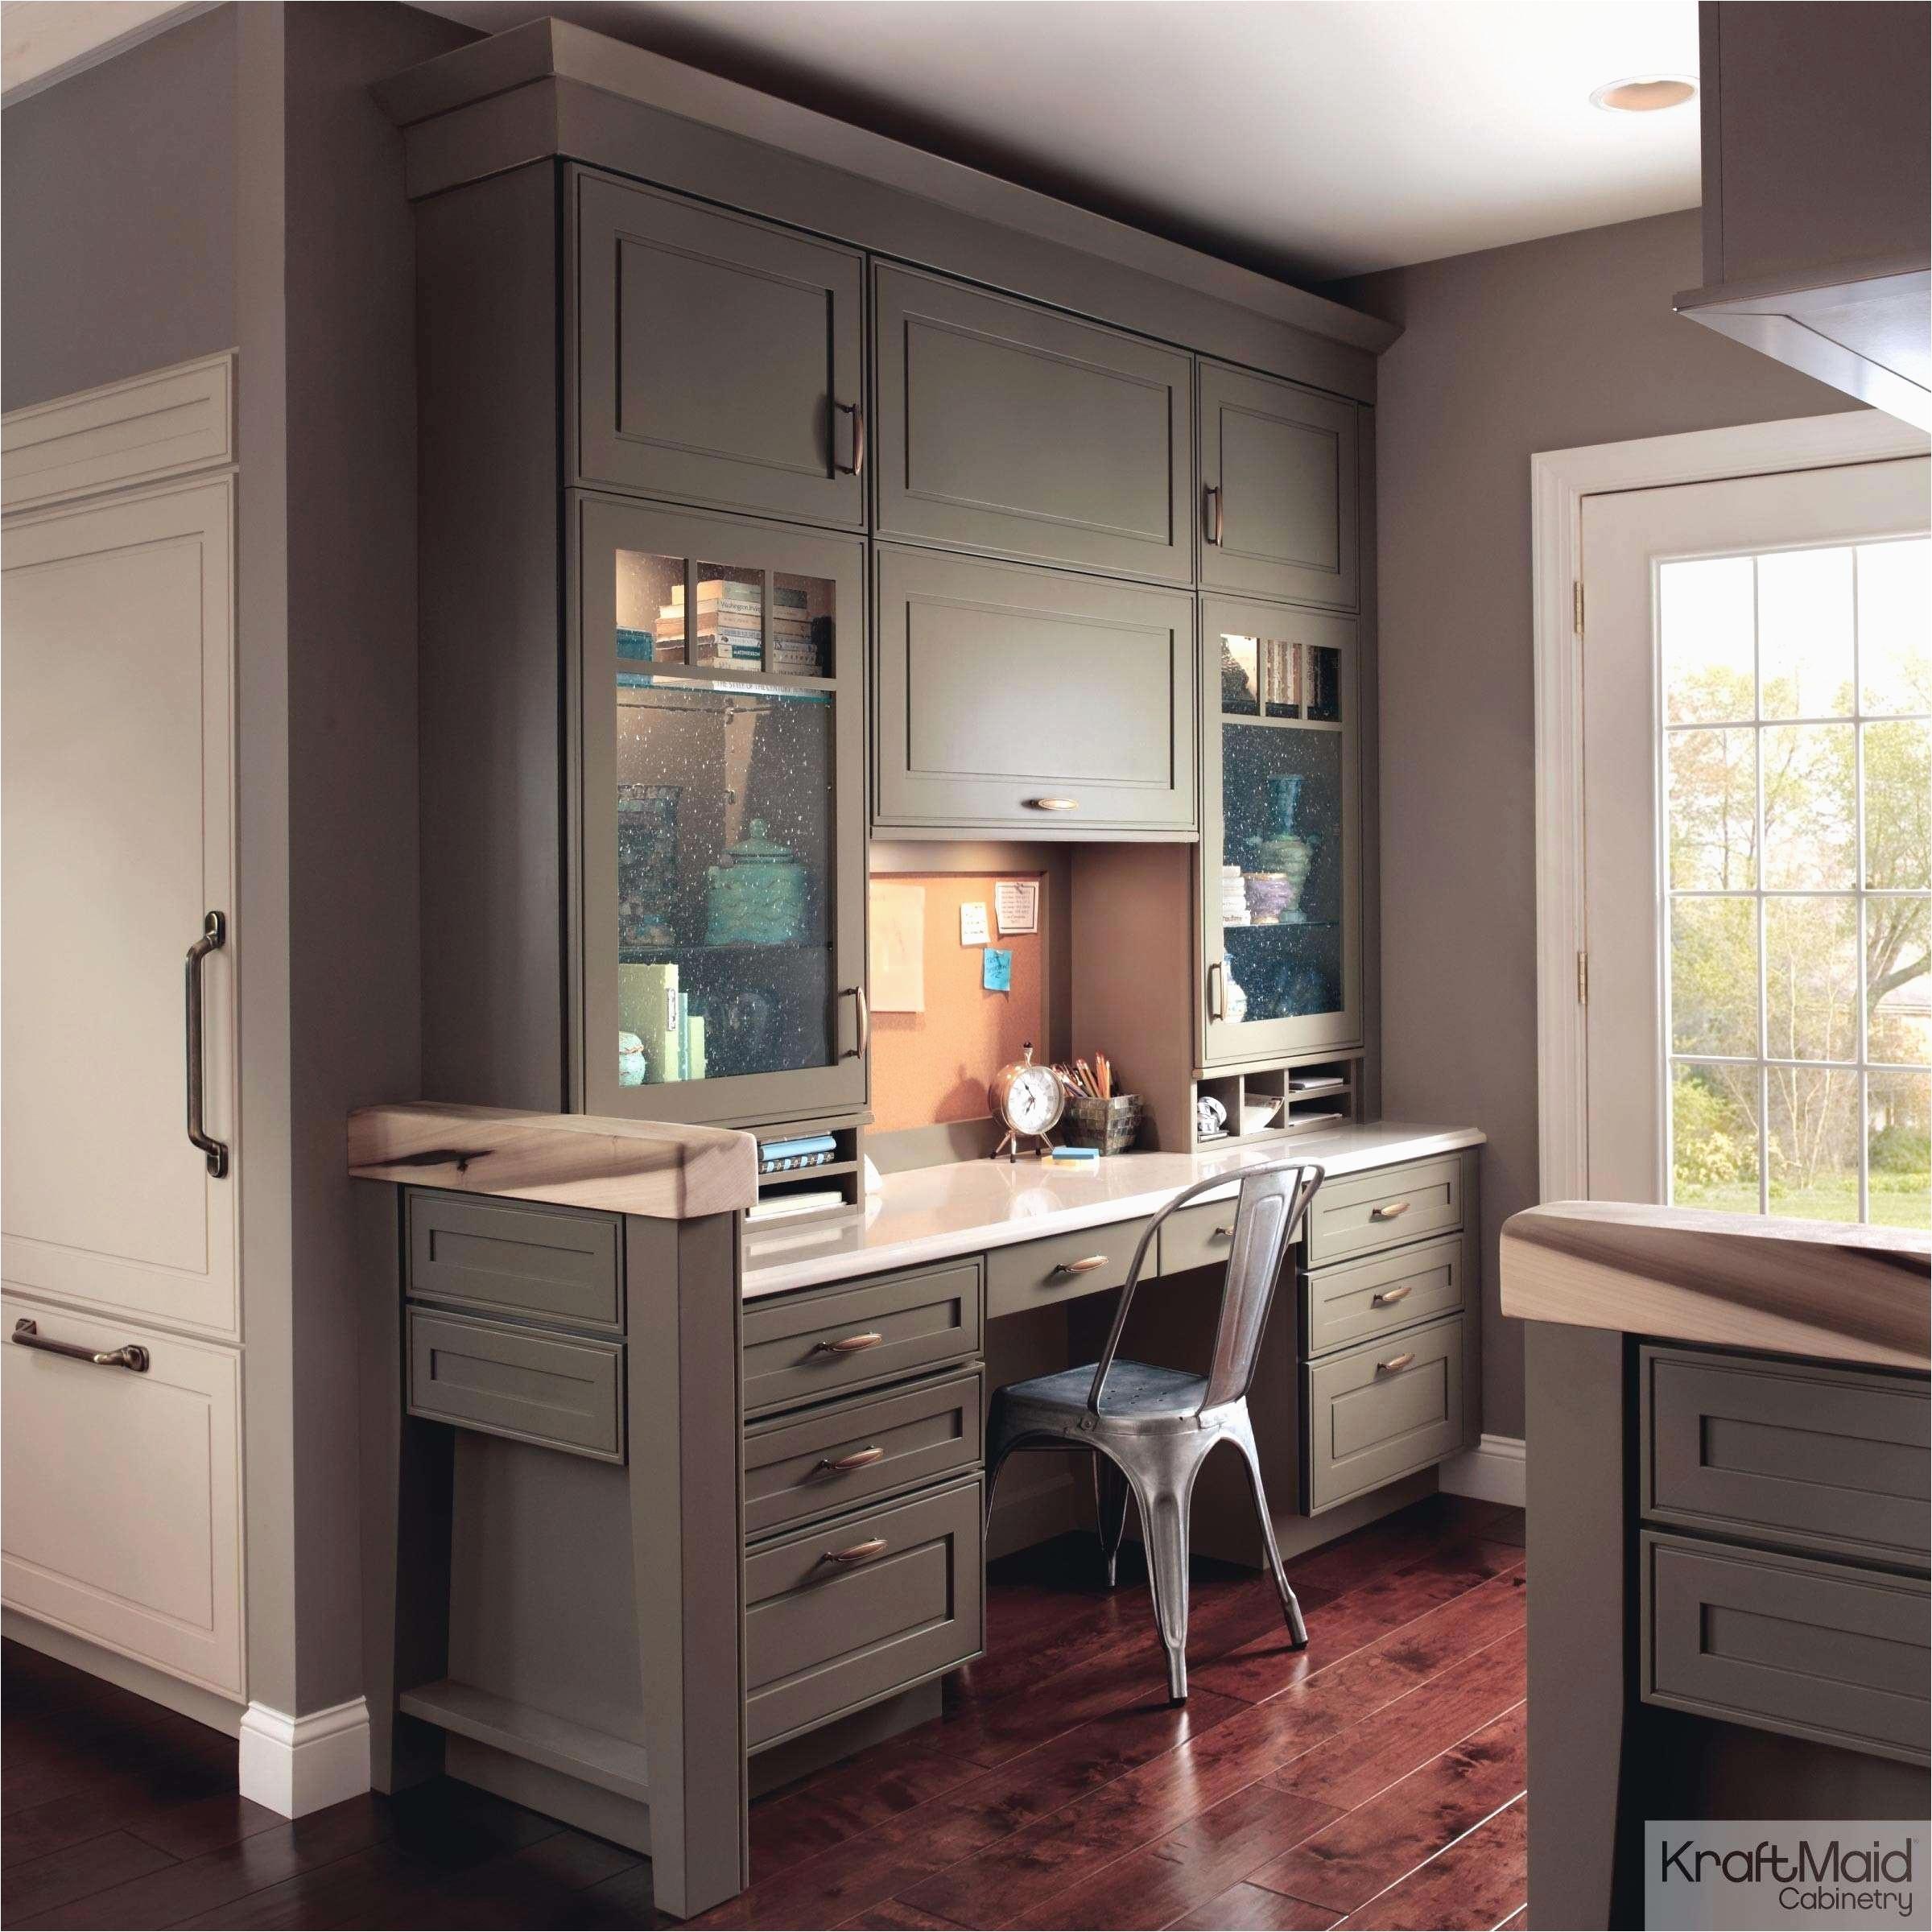 ikea kitchen cabinets measurements elegant custom kitchen cabinets lovely kitchen cabinet 0d design ideas